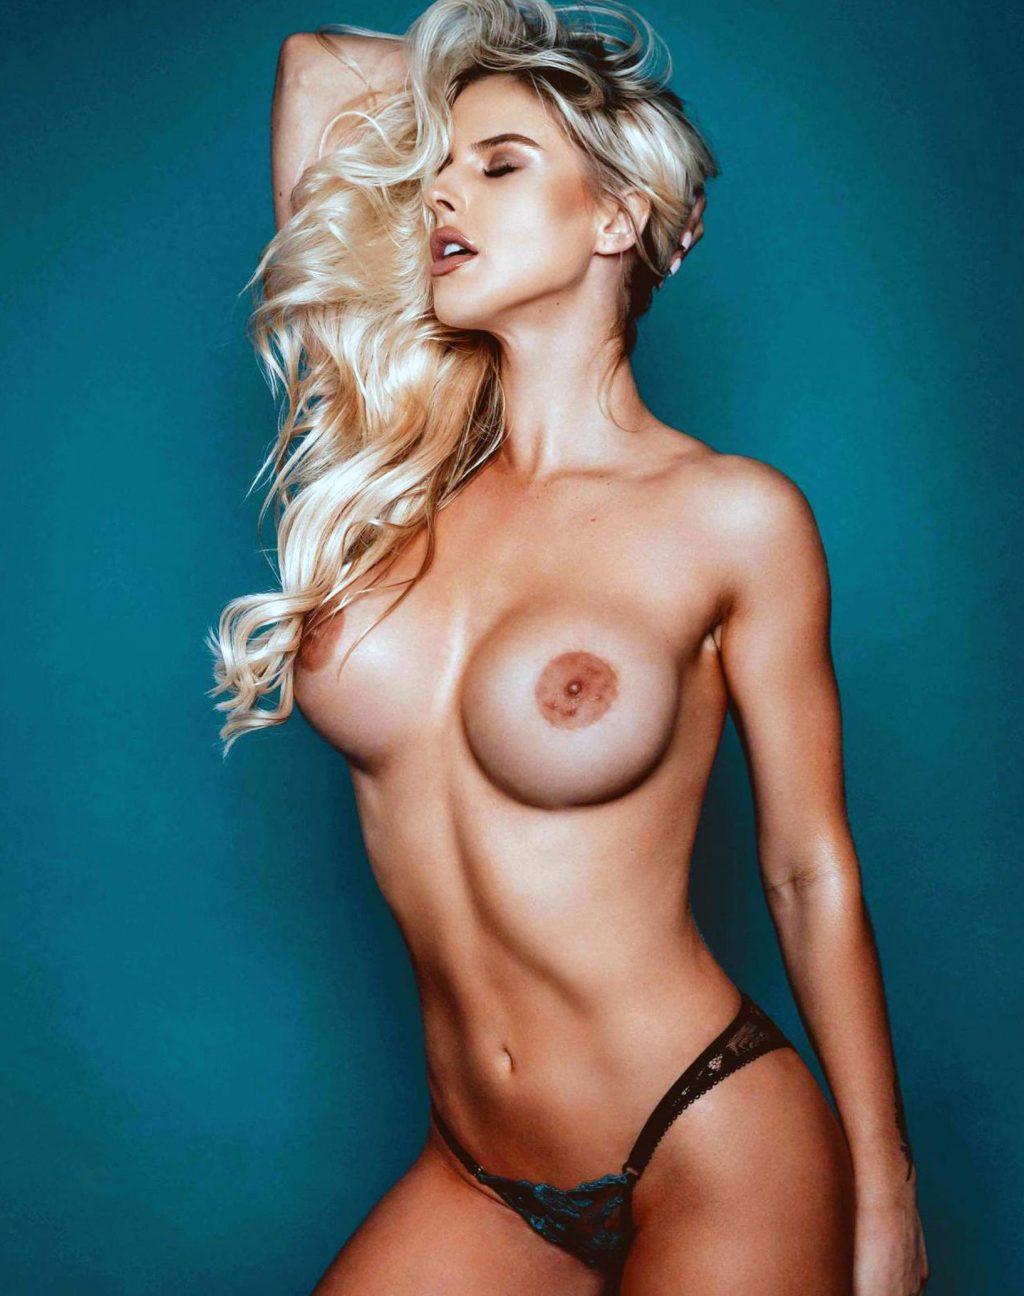 Brennah Black nipples